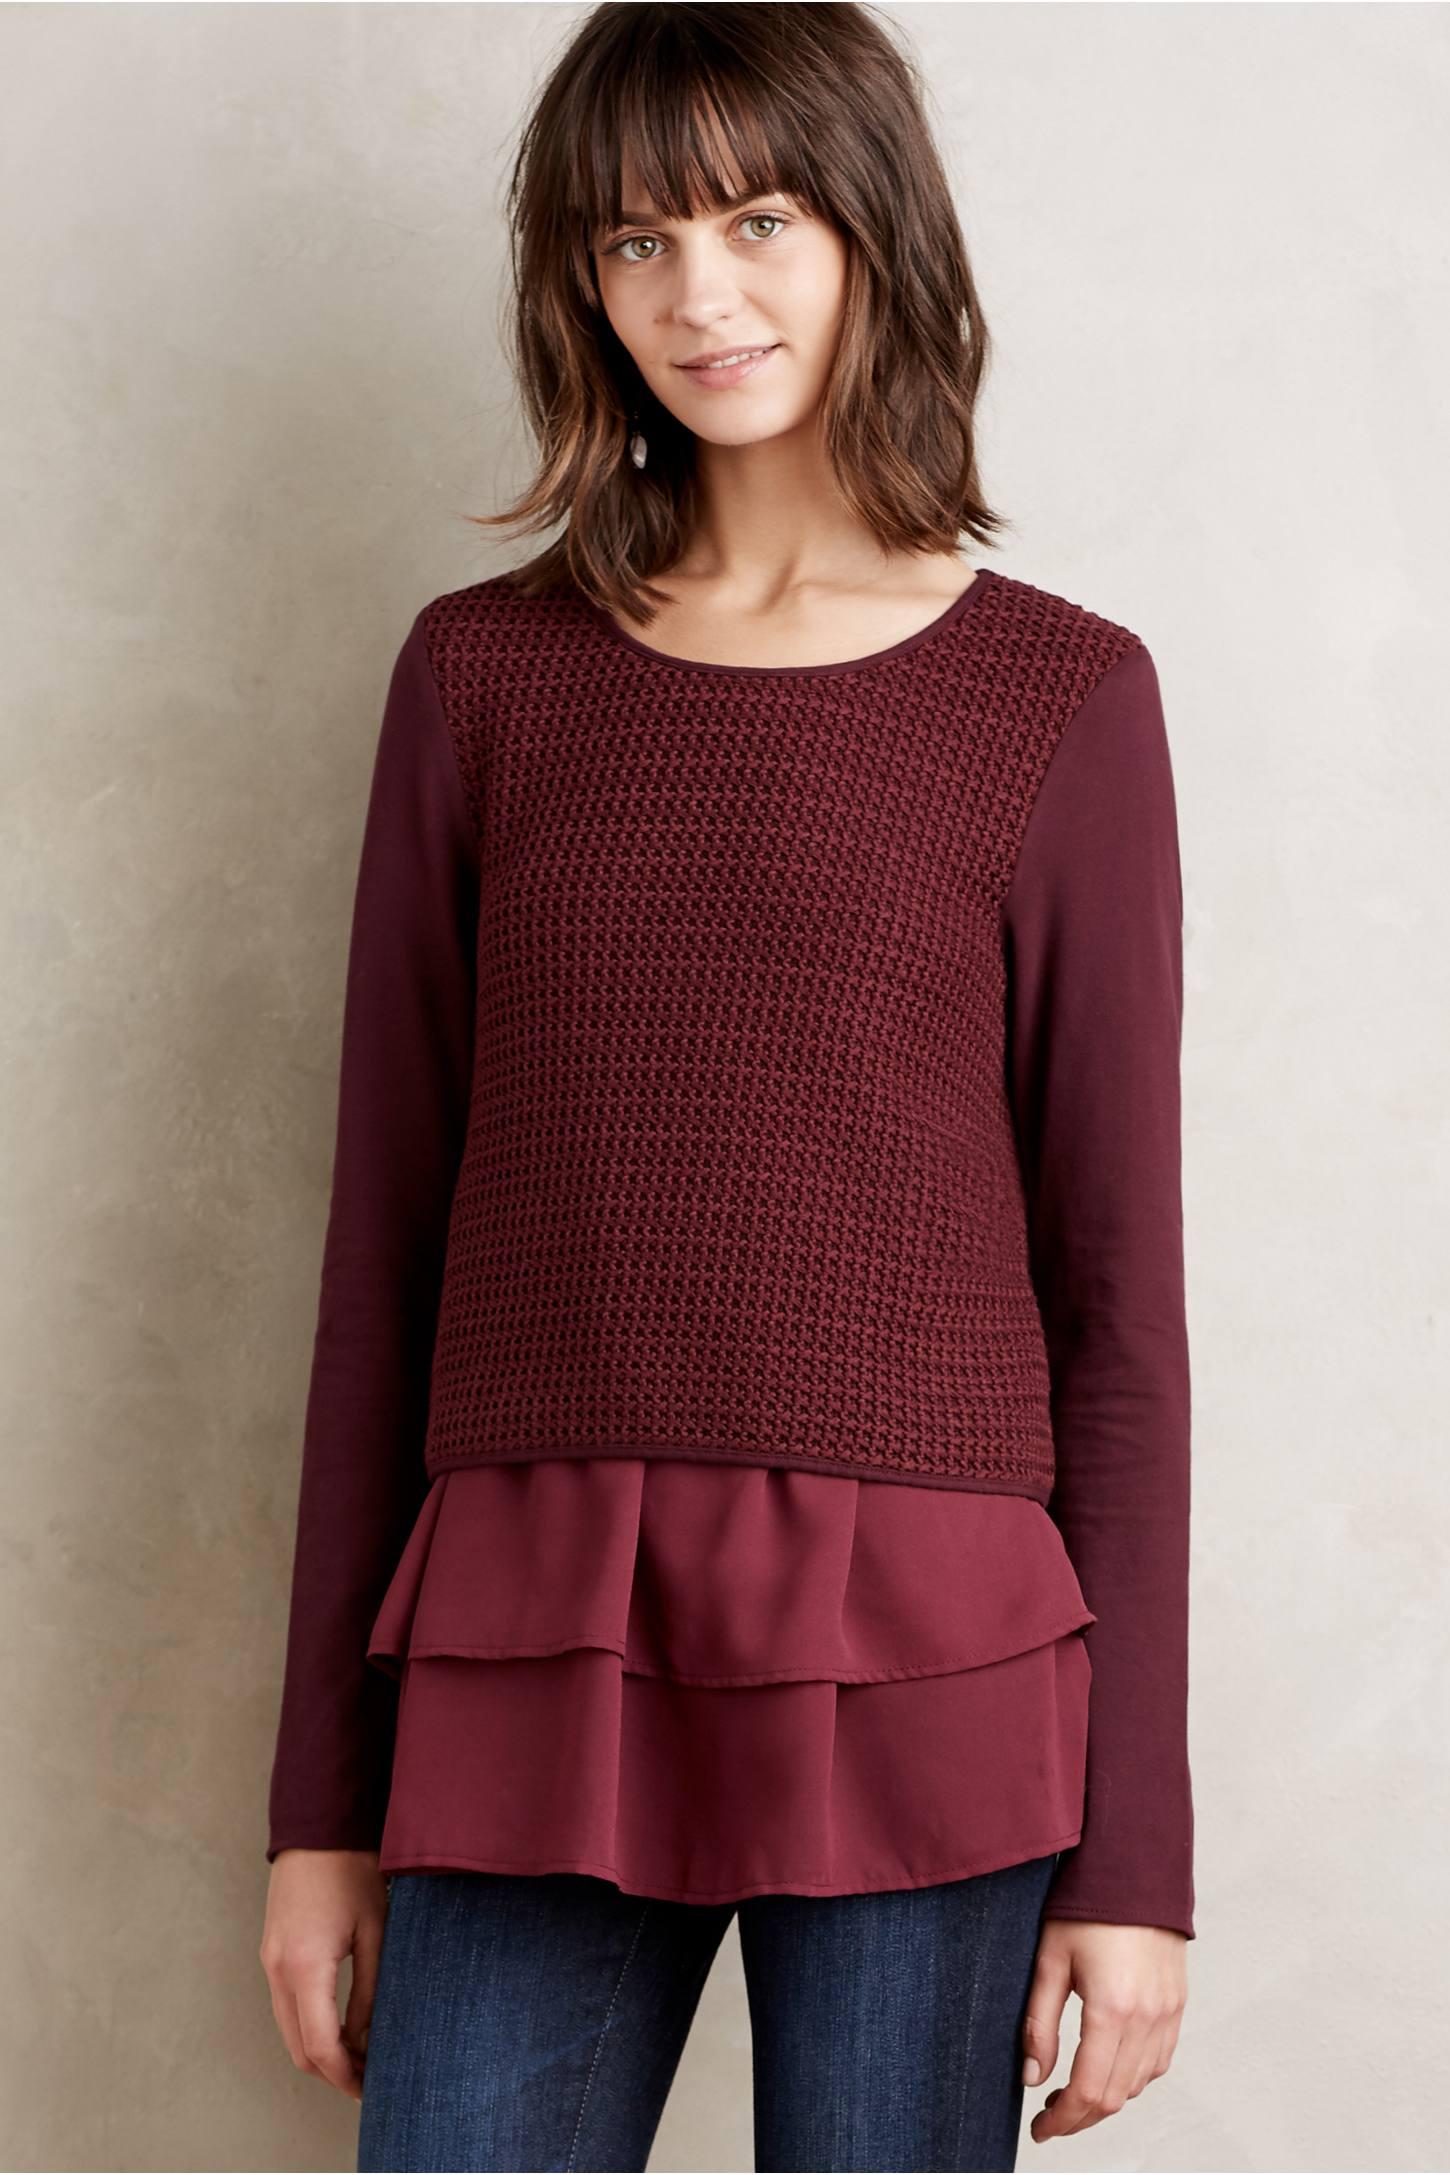 Layered Namsen Pullover